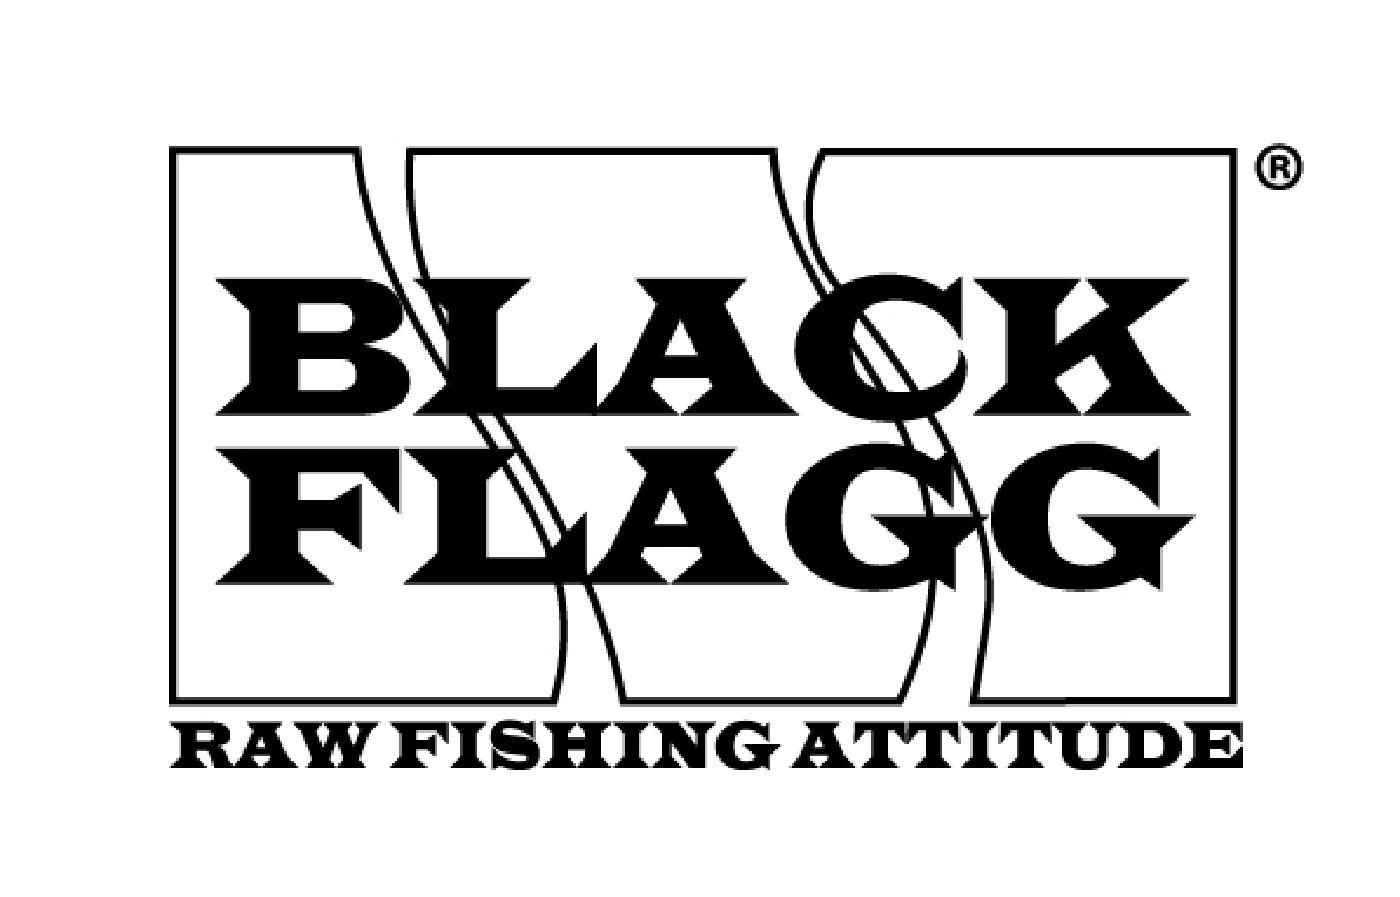 logo-black-flagg-box-empty-1400x897